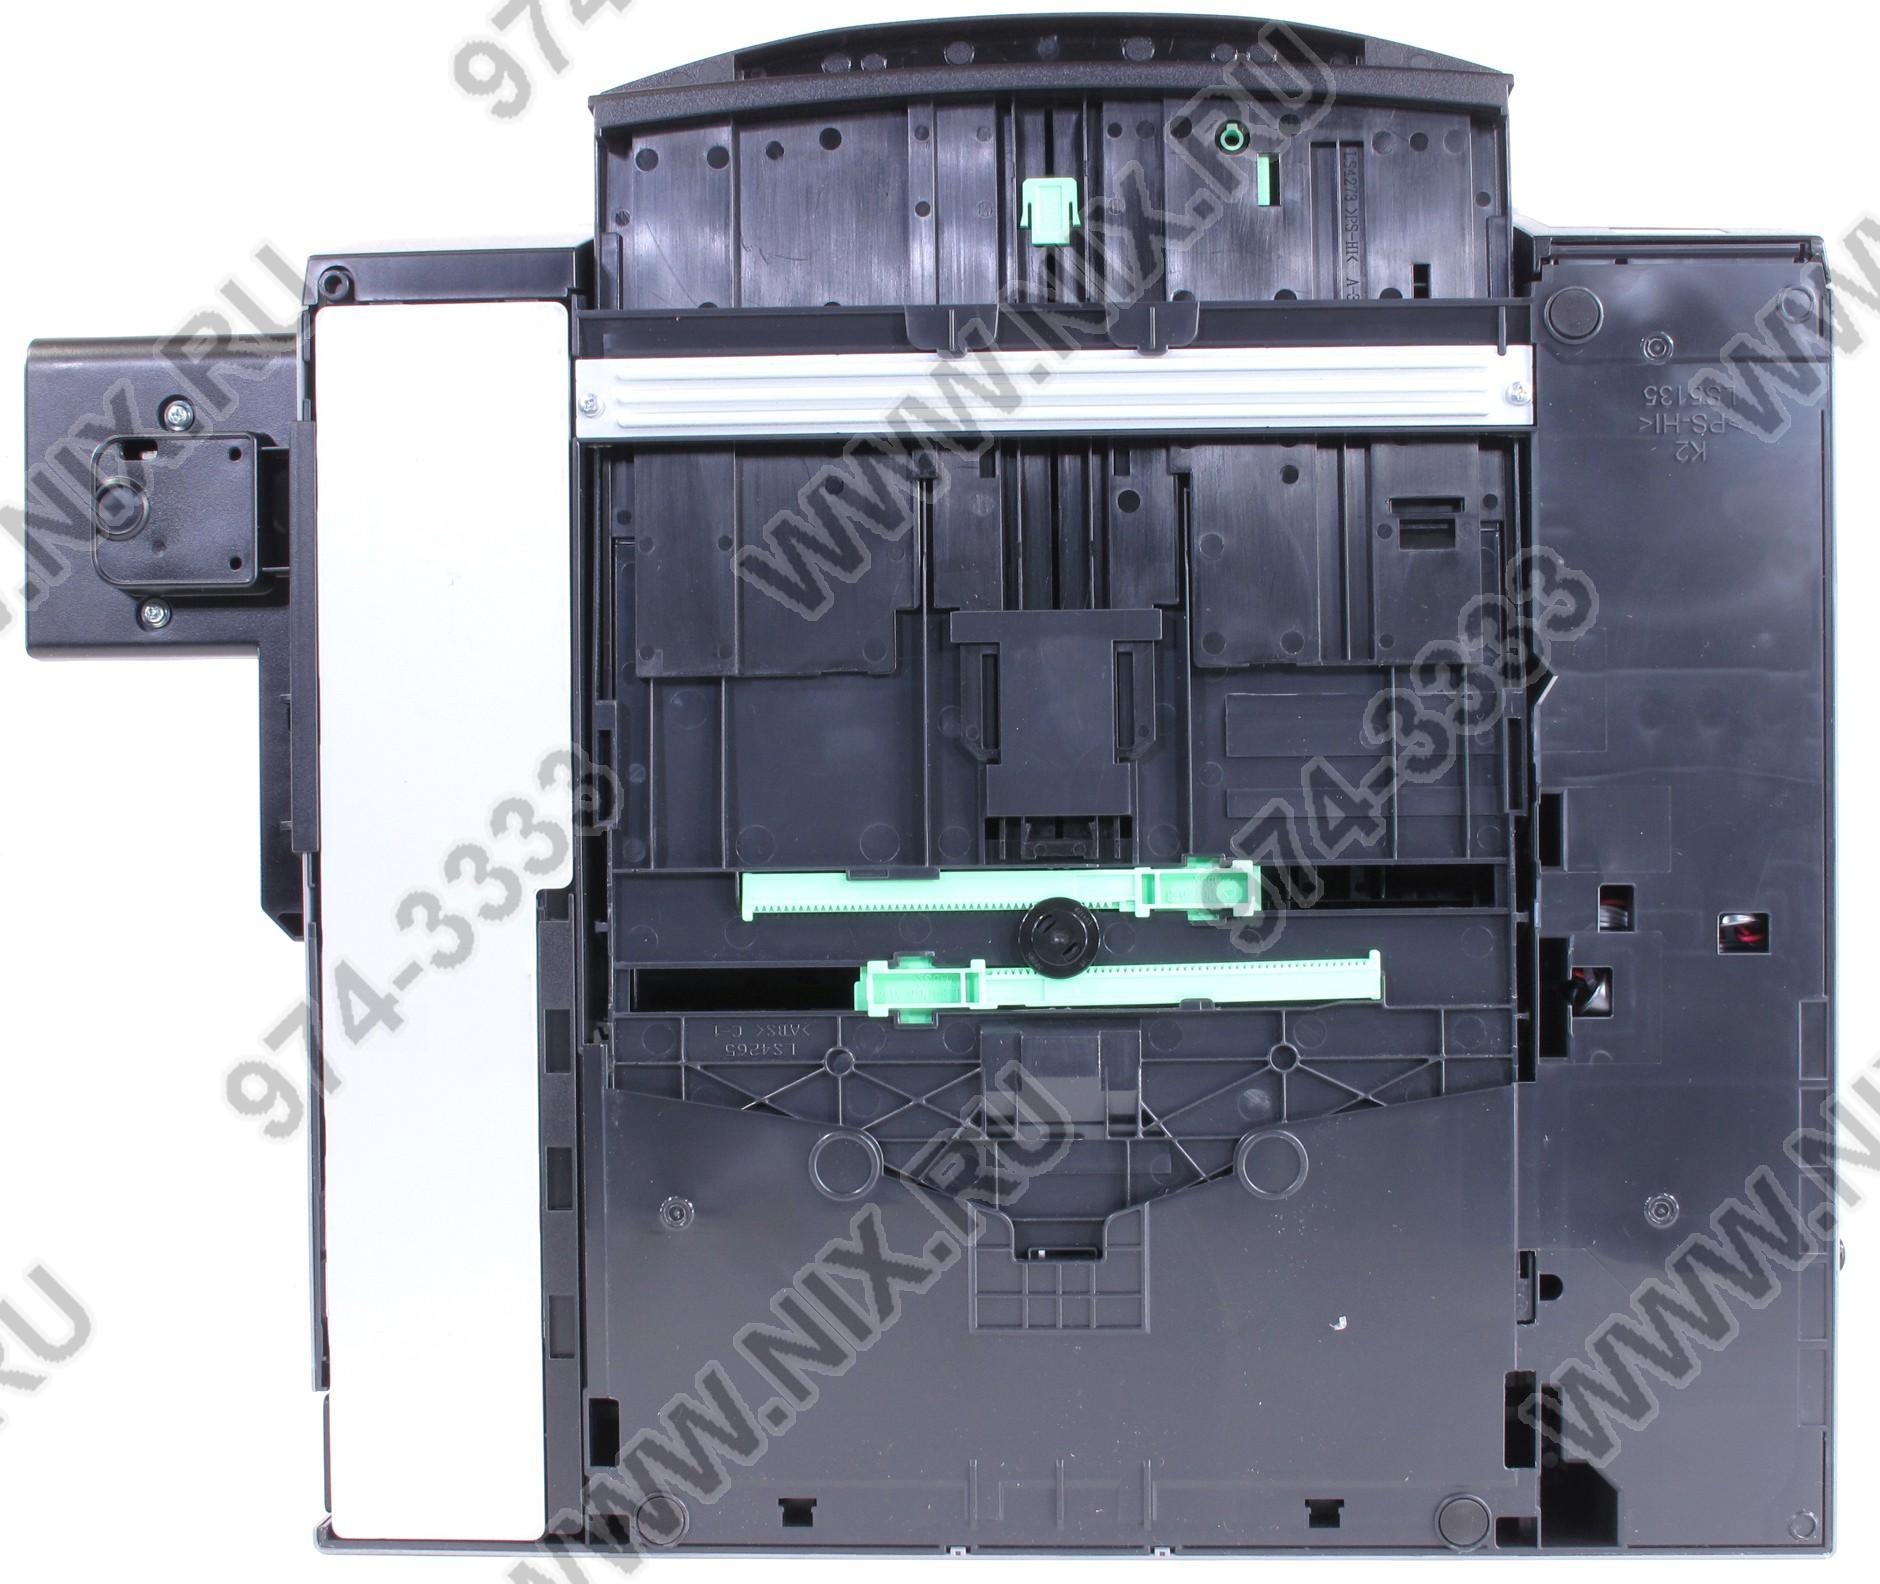 Mb s1g4 hp 4525s 484gj02011 (uma)